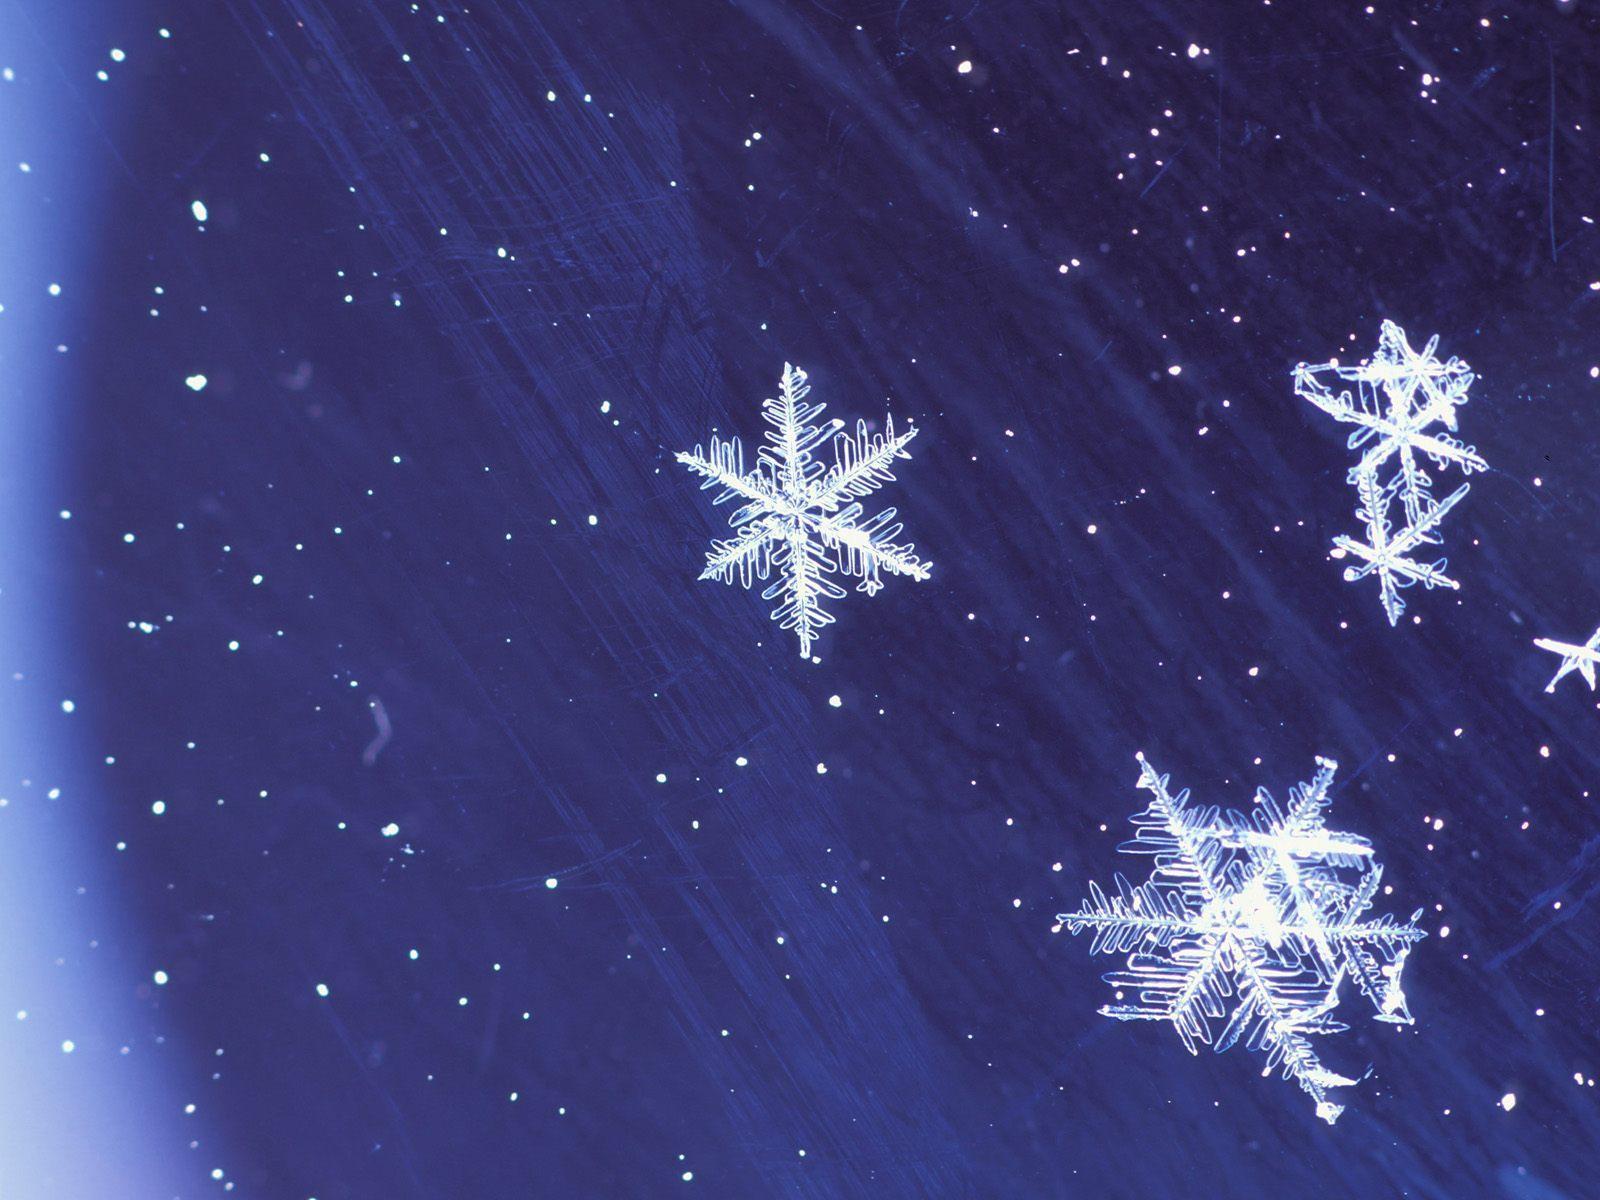 Free Christmas Wallpapers for Desktop